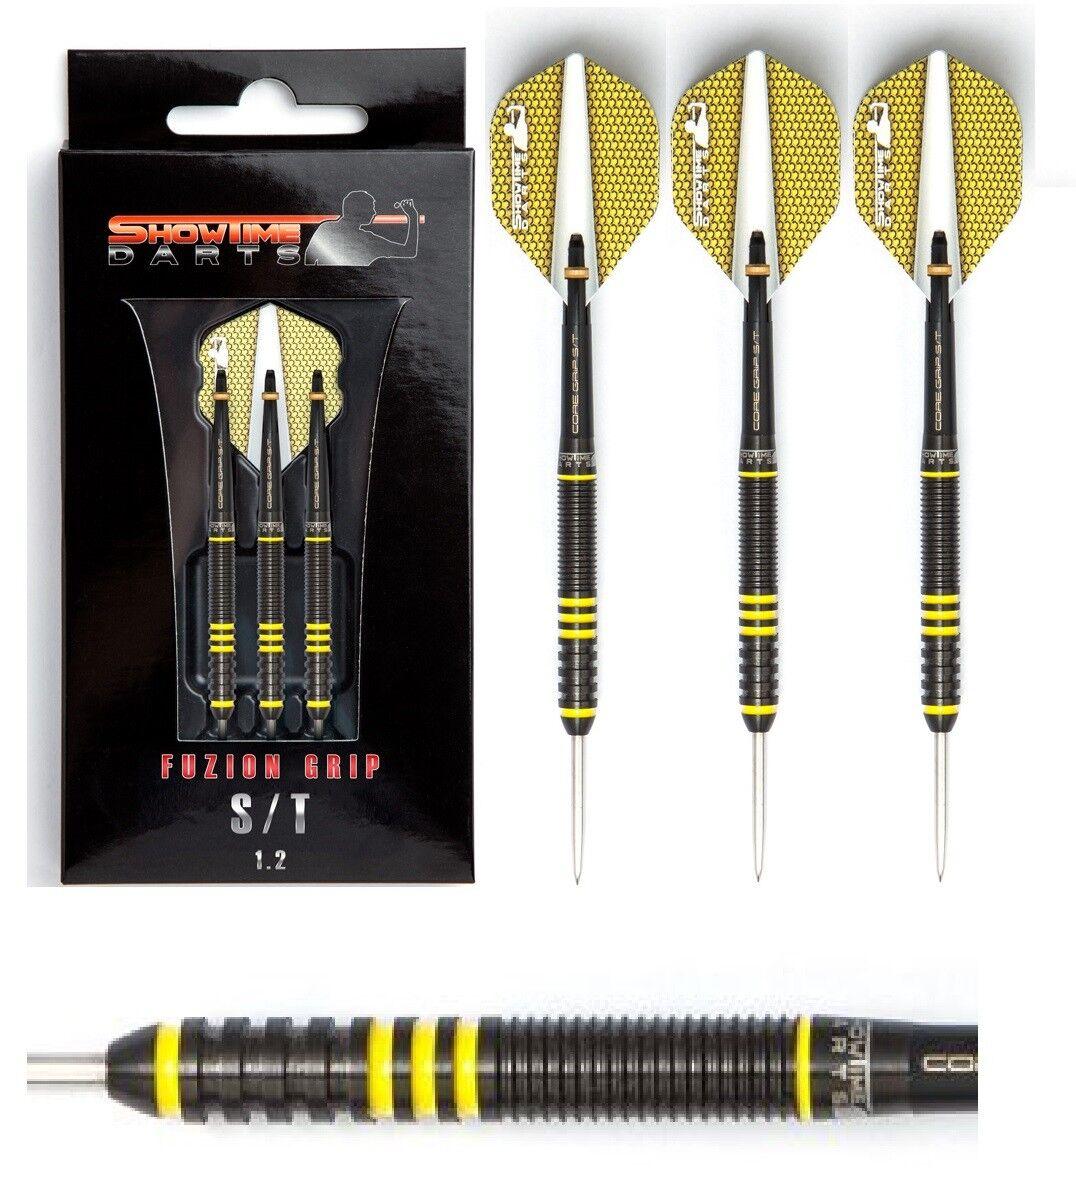 Showtime Dart - Fuzion Grip S T T T 1.2 schwarz Gelb 21g (Steel Dart) Dartpfeile e8202d